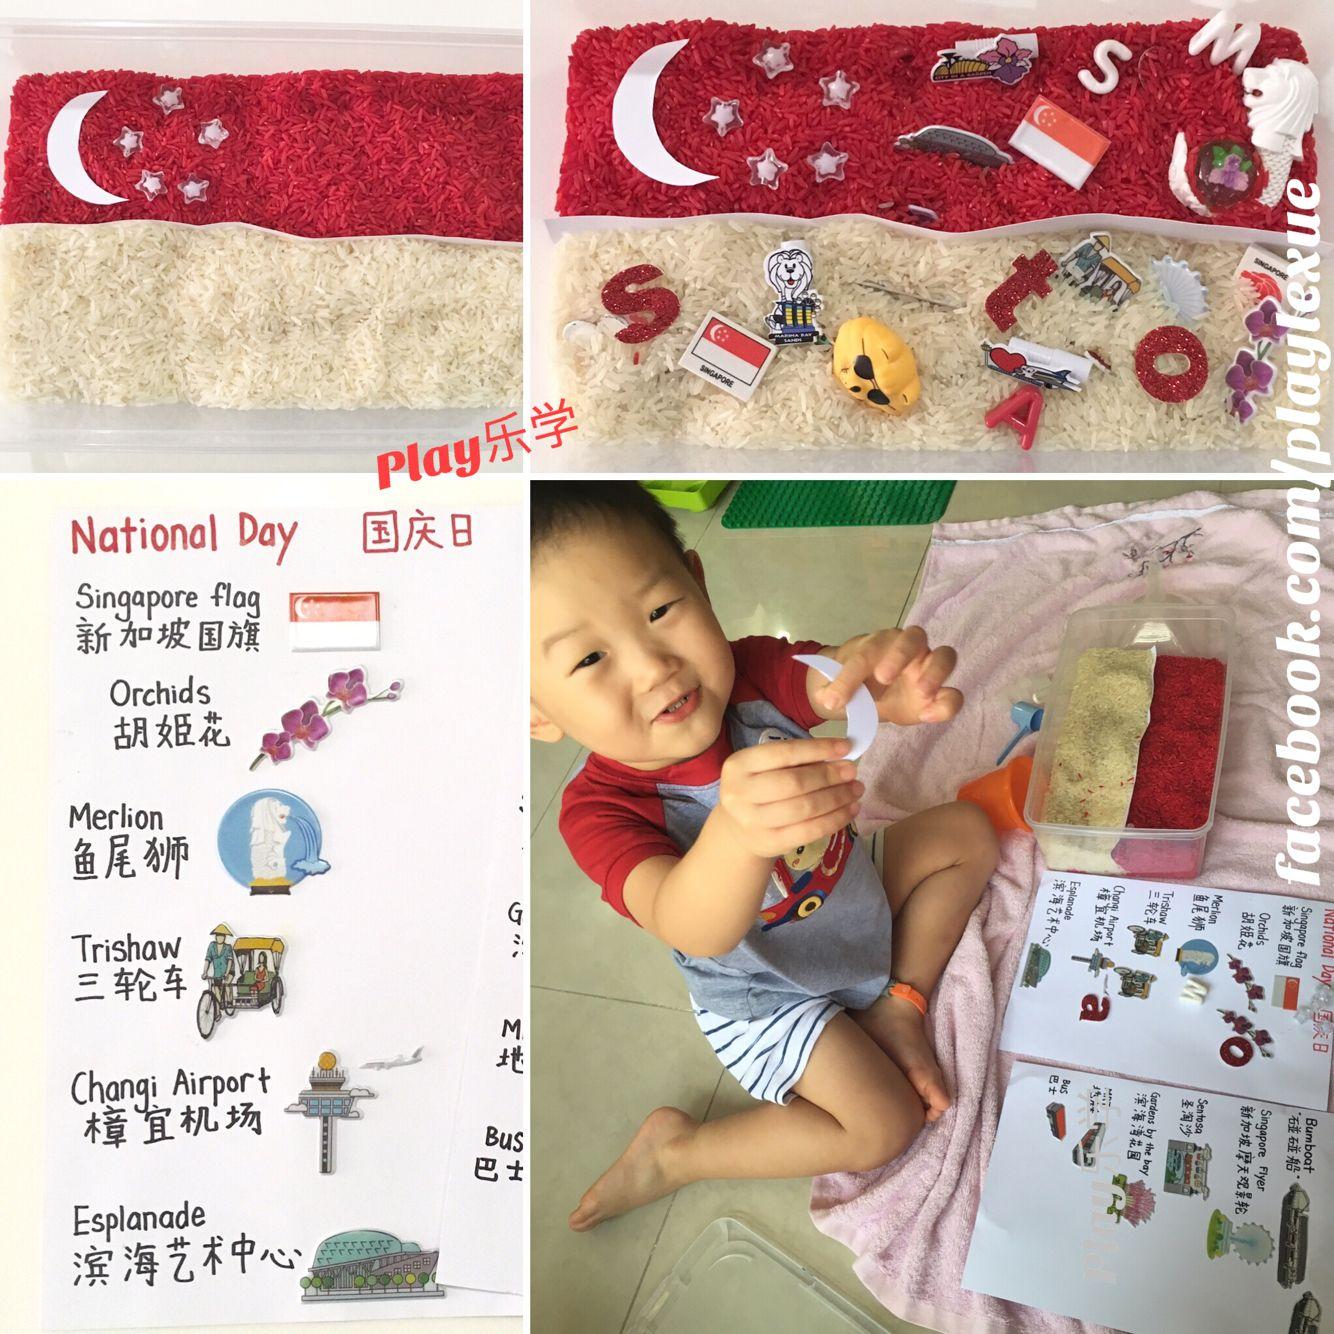 Singapore National Day Rice Sensory Treasure Hunt Bin With